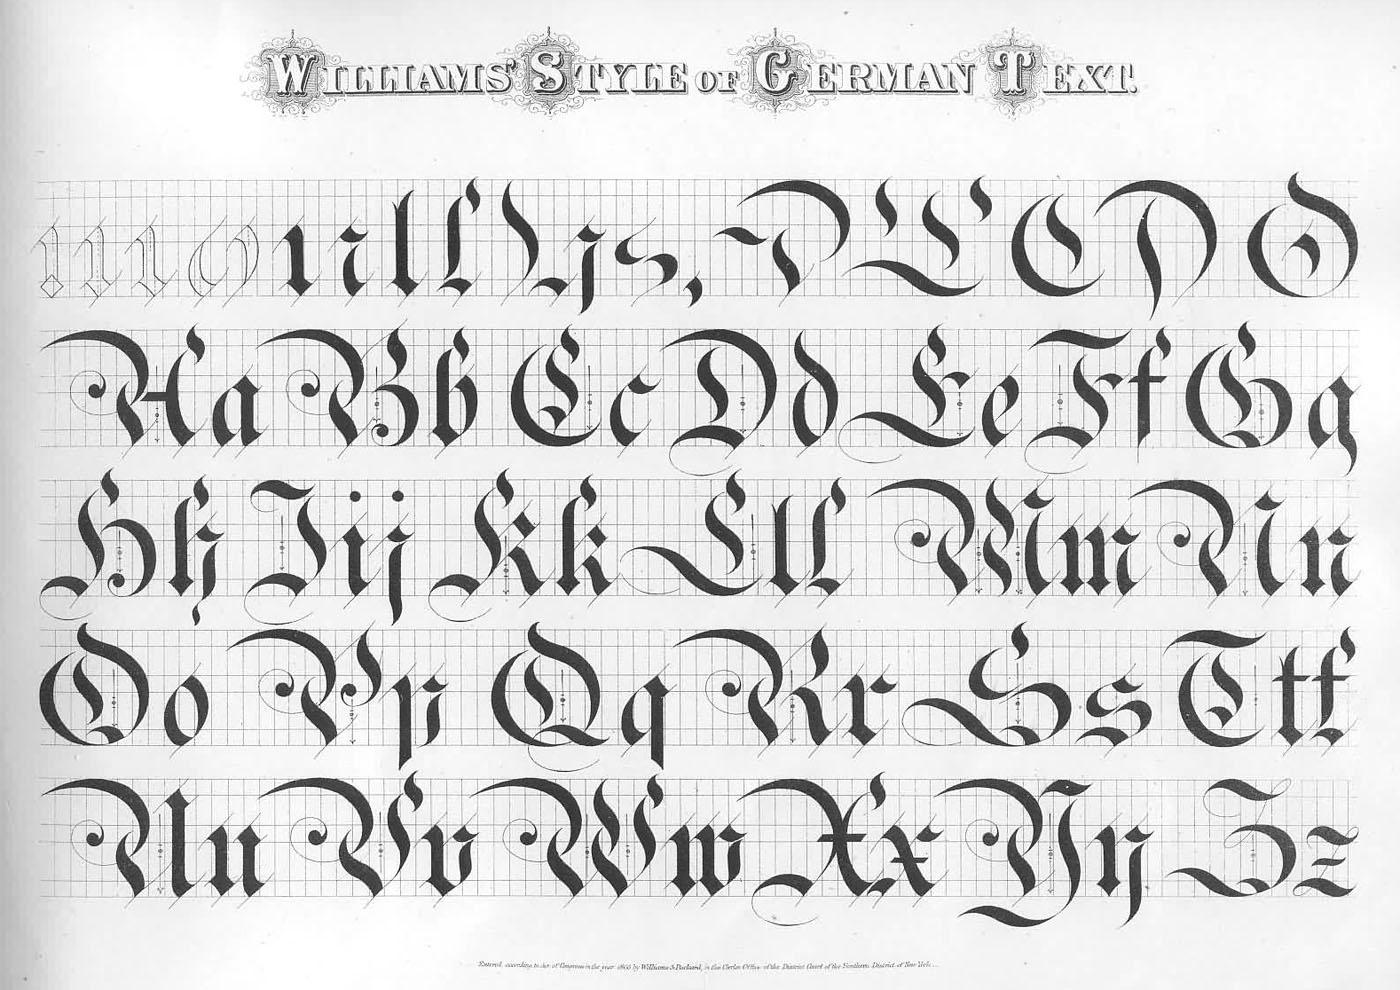 Exceptionnel Dafont Tatouage Ecriture - Galerie Tatouage SB67